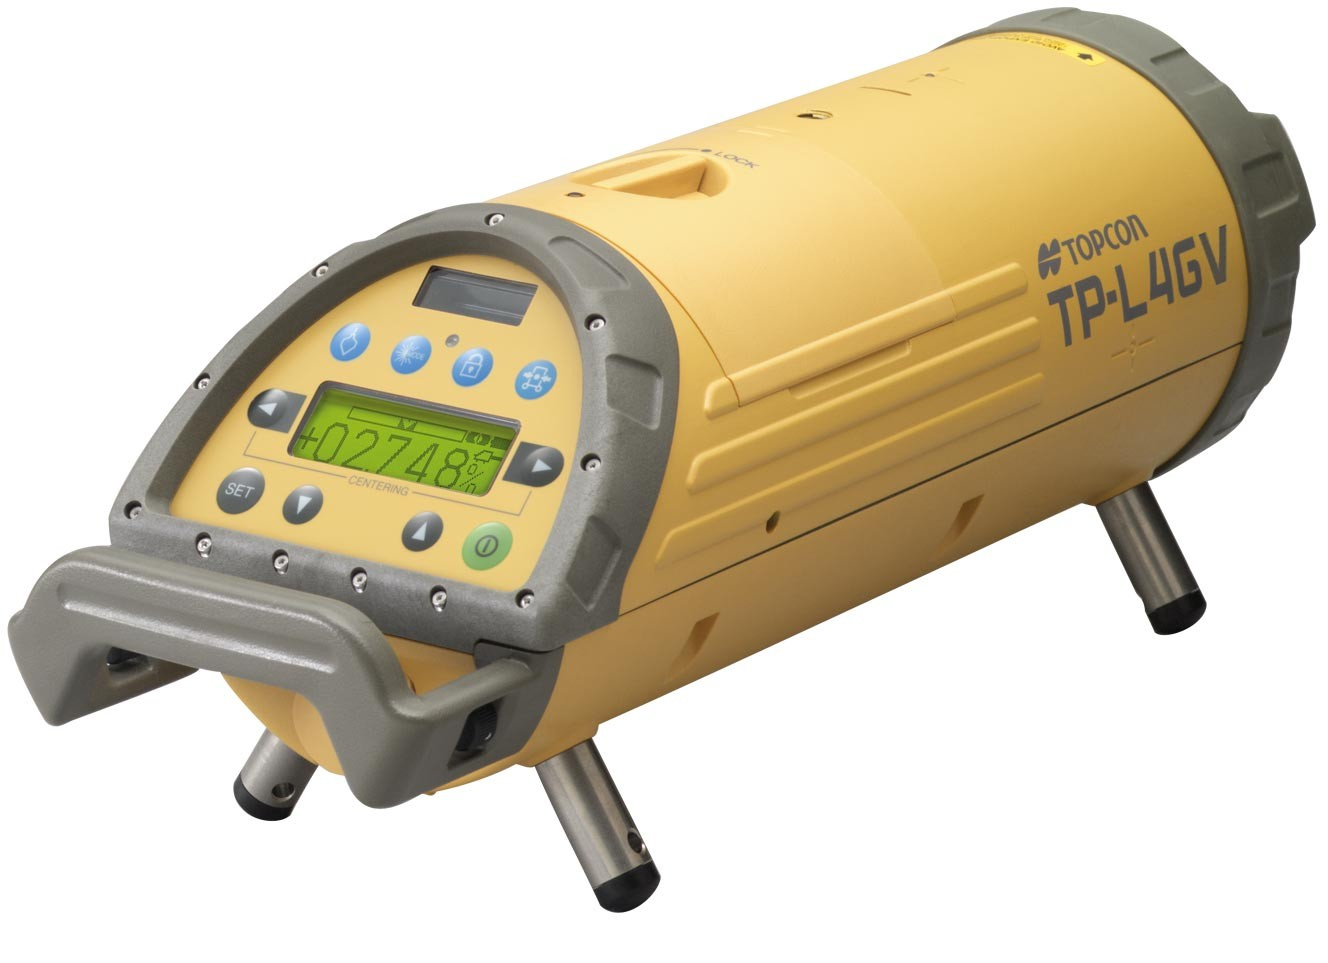 Topcon Tp L4gv Green Beam Pipe Laser